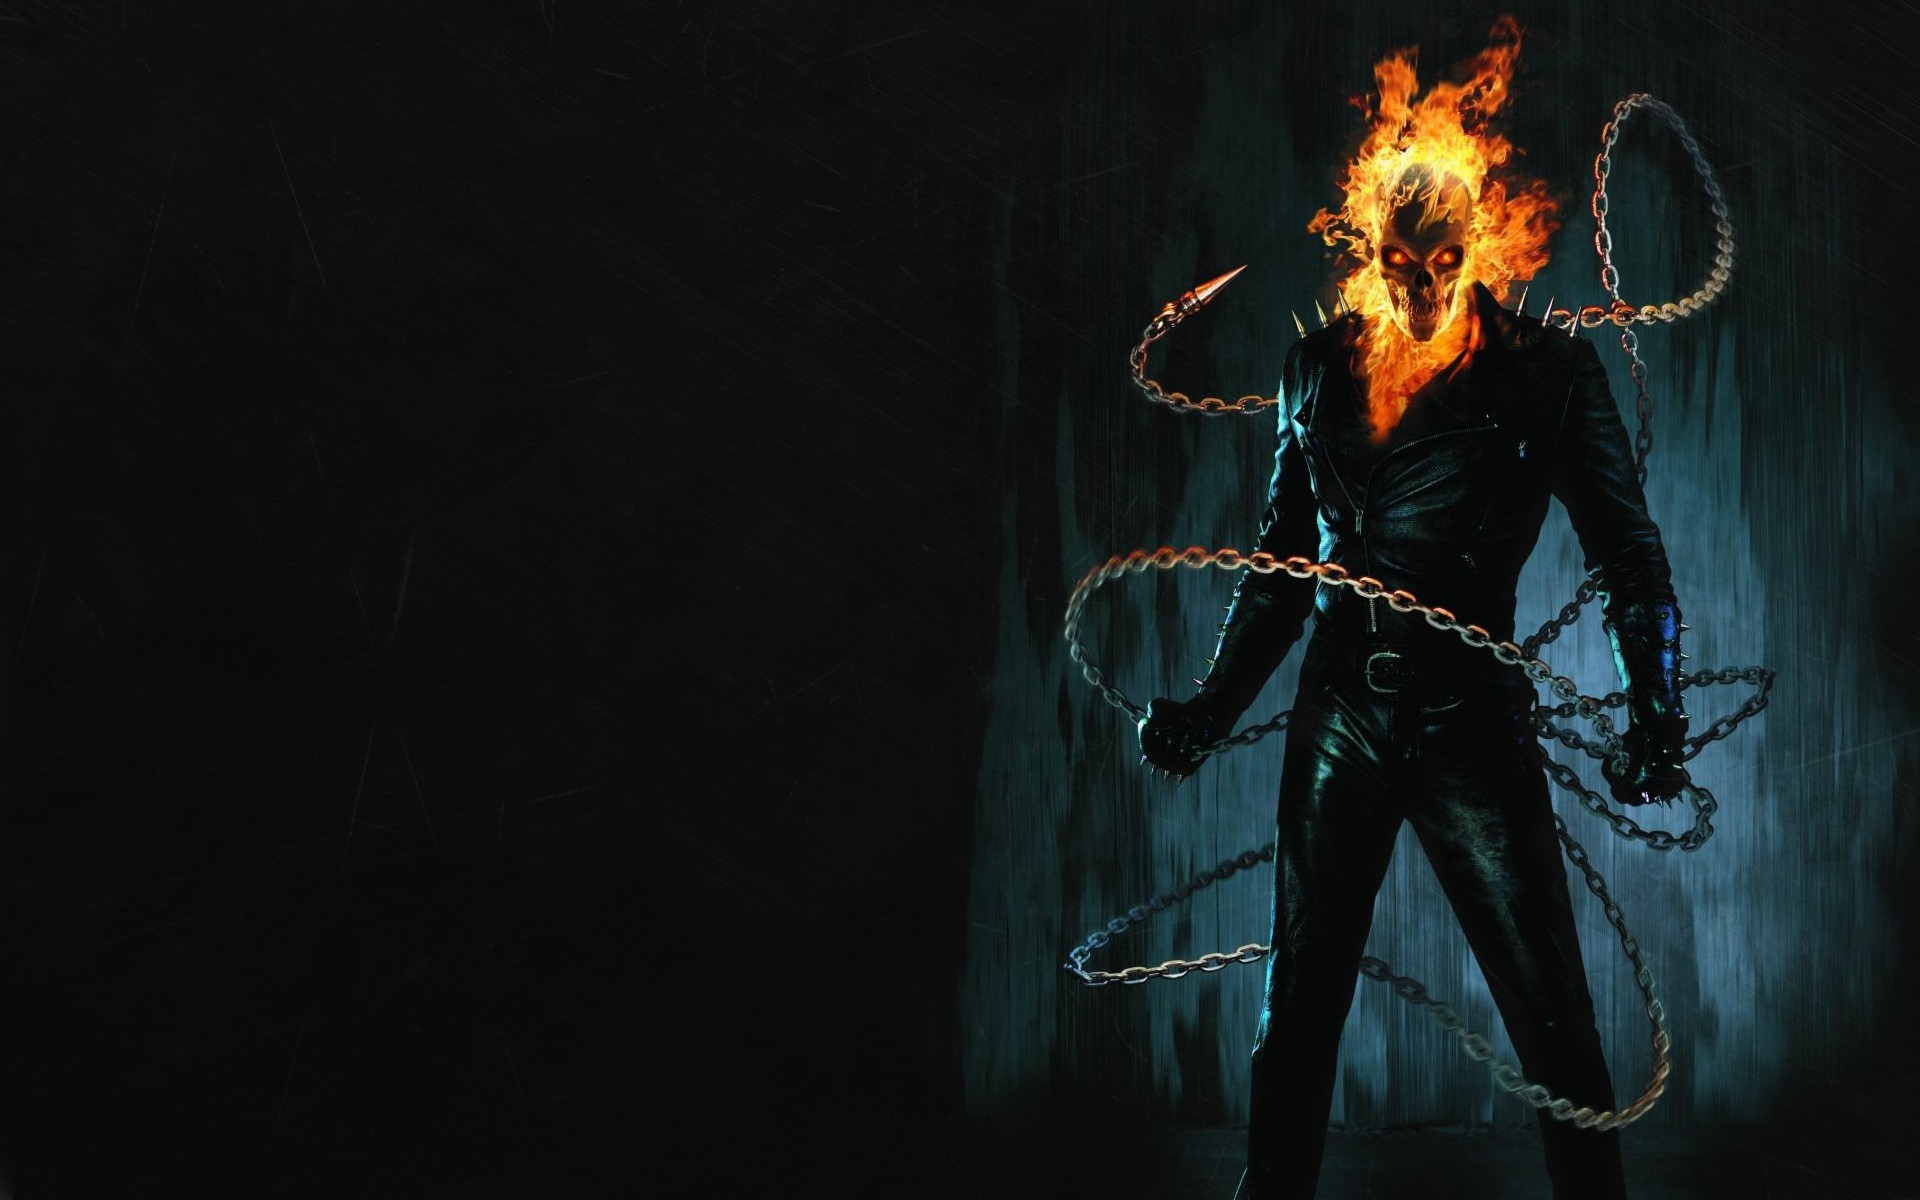 Ghost Rider Computer Wallpapers Desktop Backgrounds 1920x1200